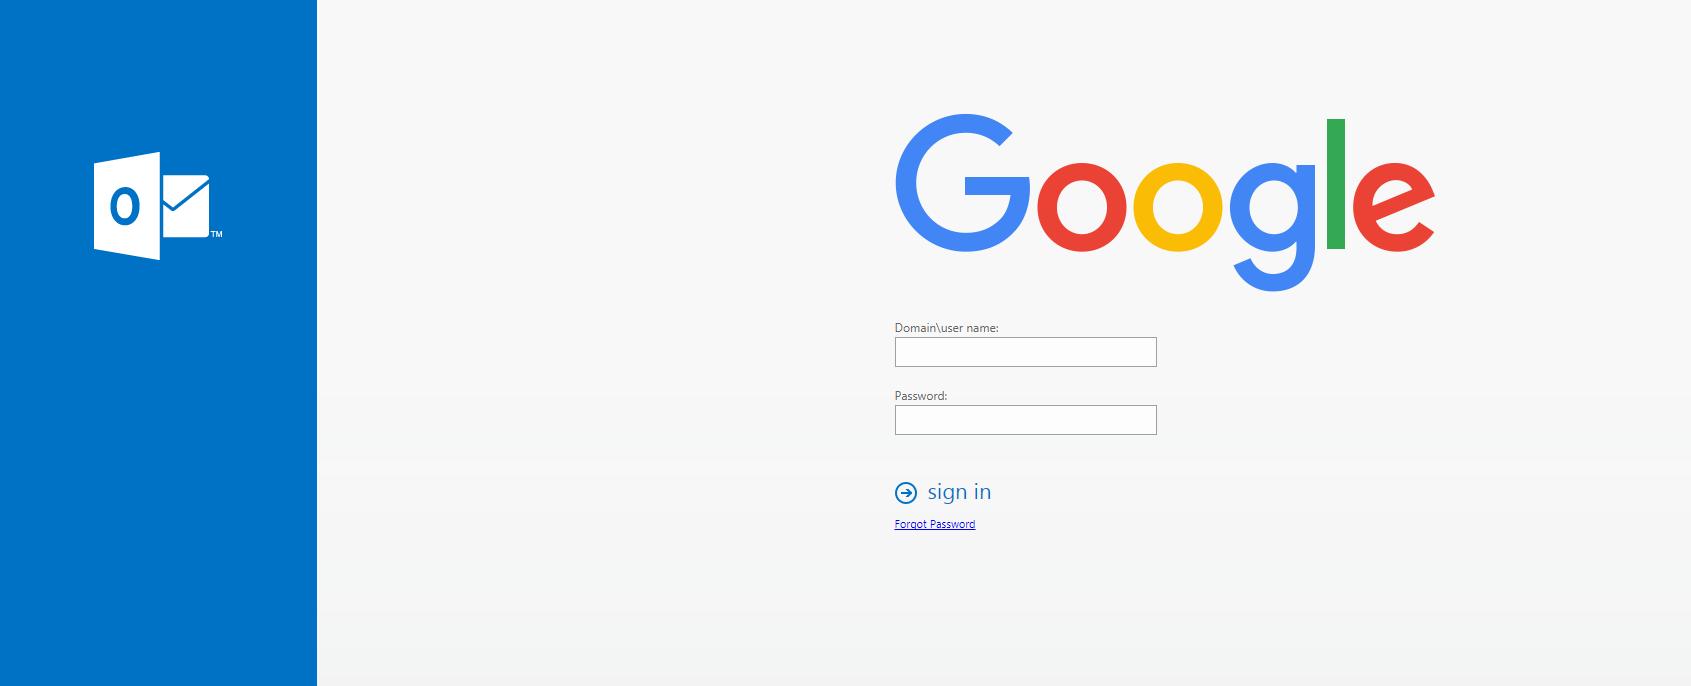 Images Branding Googlelogo 2x Googlelogo_color_272x92dp Png , (+).